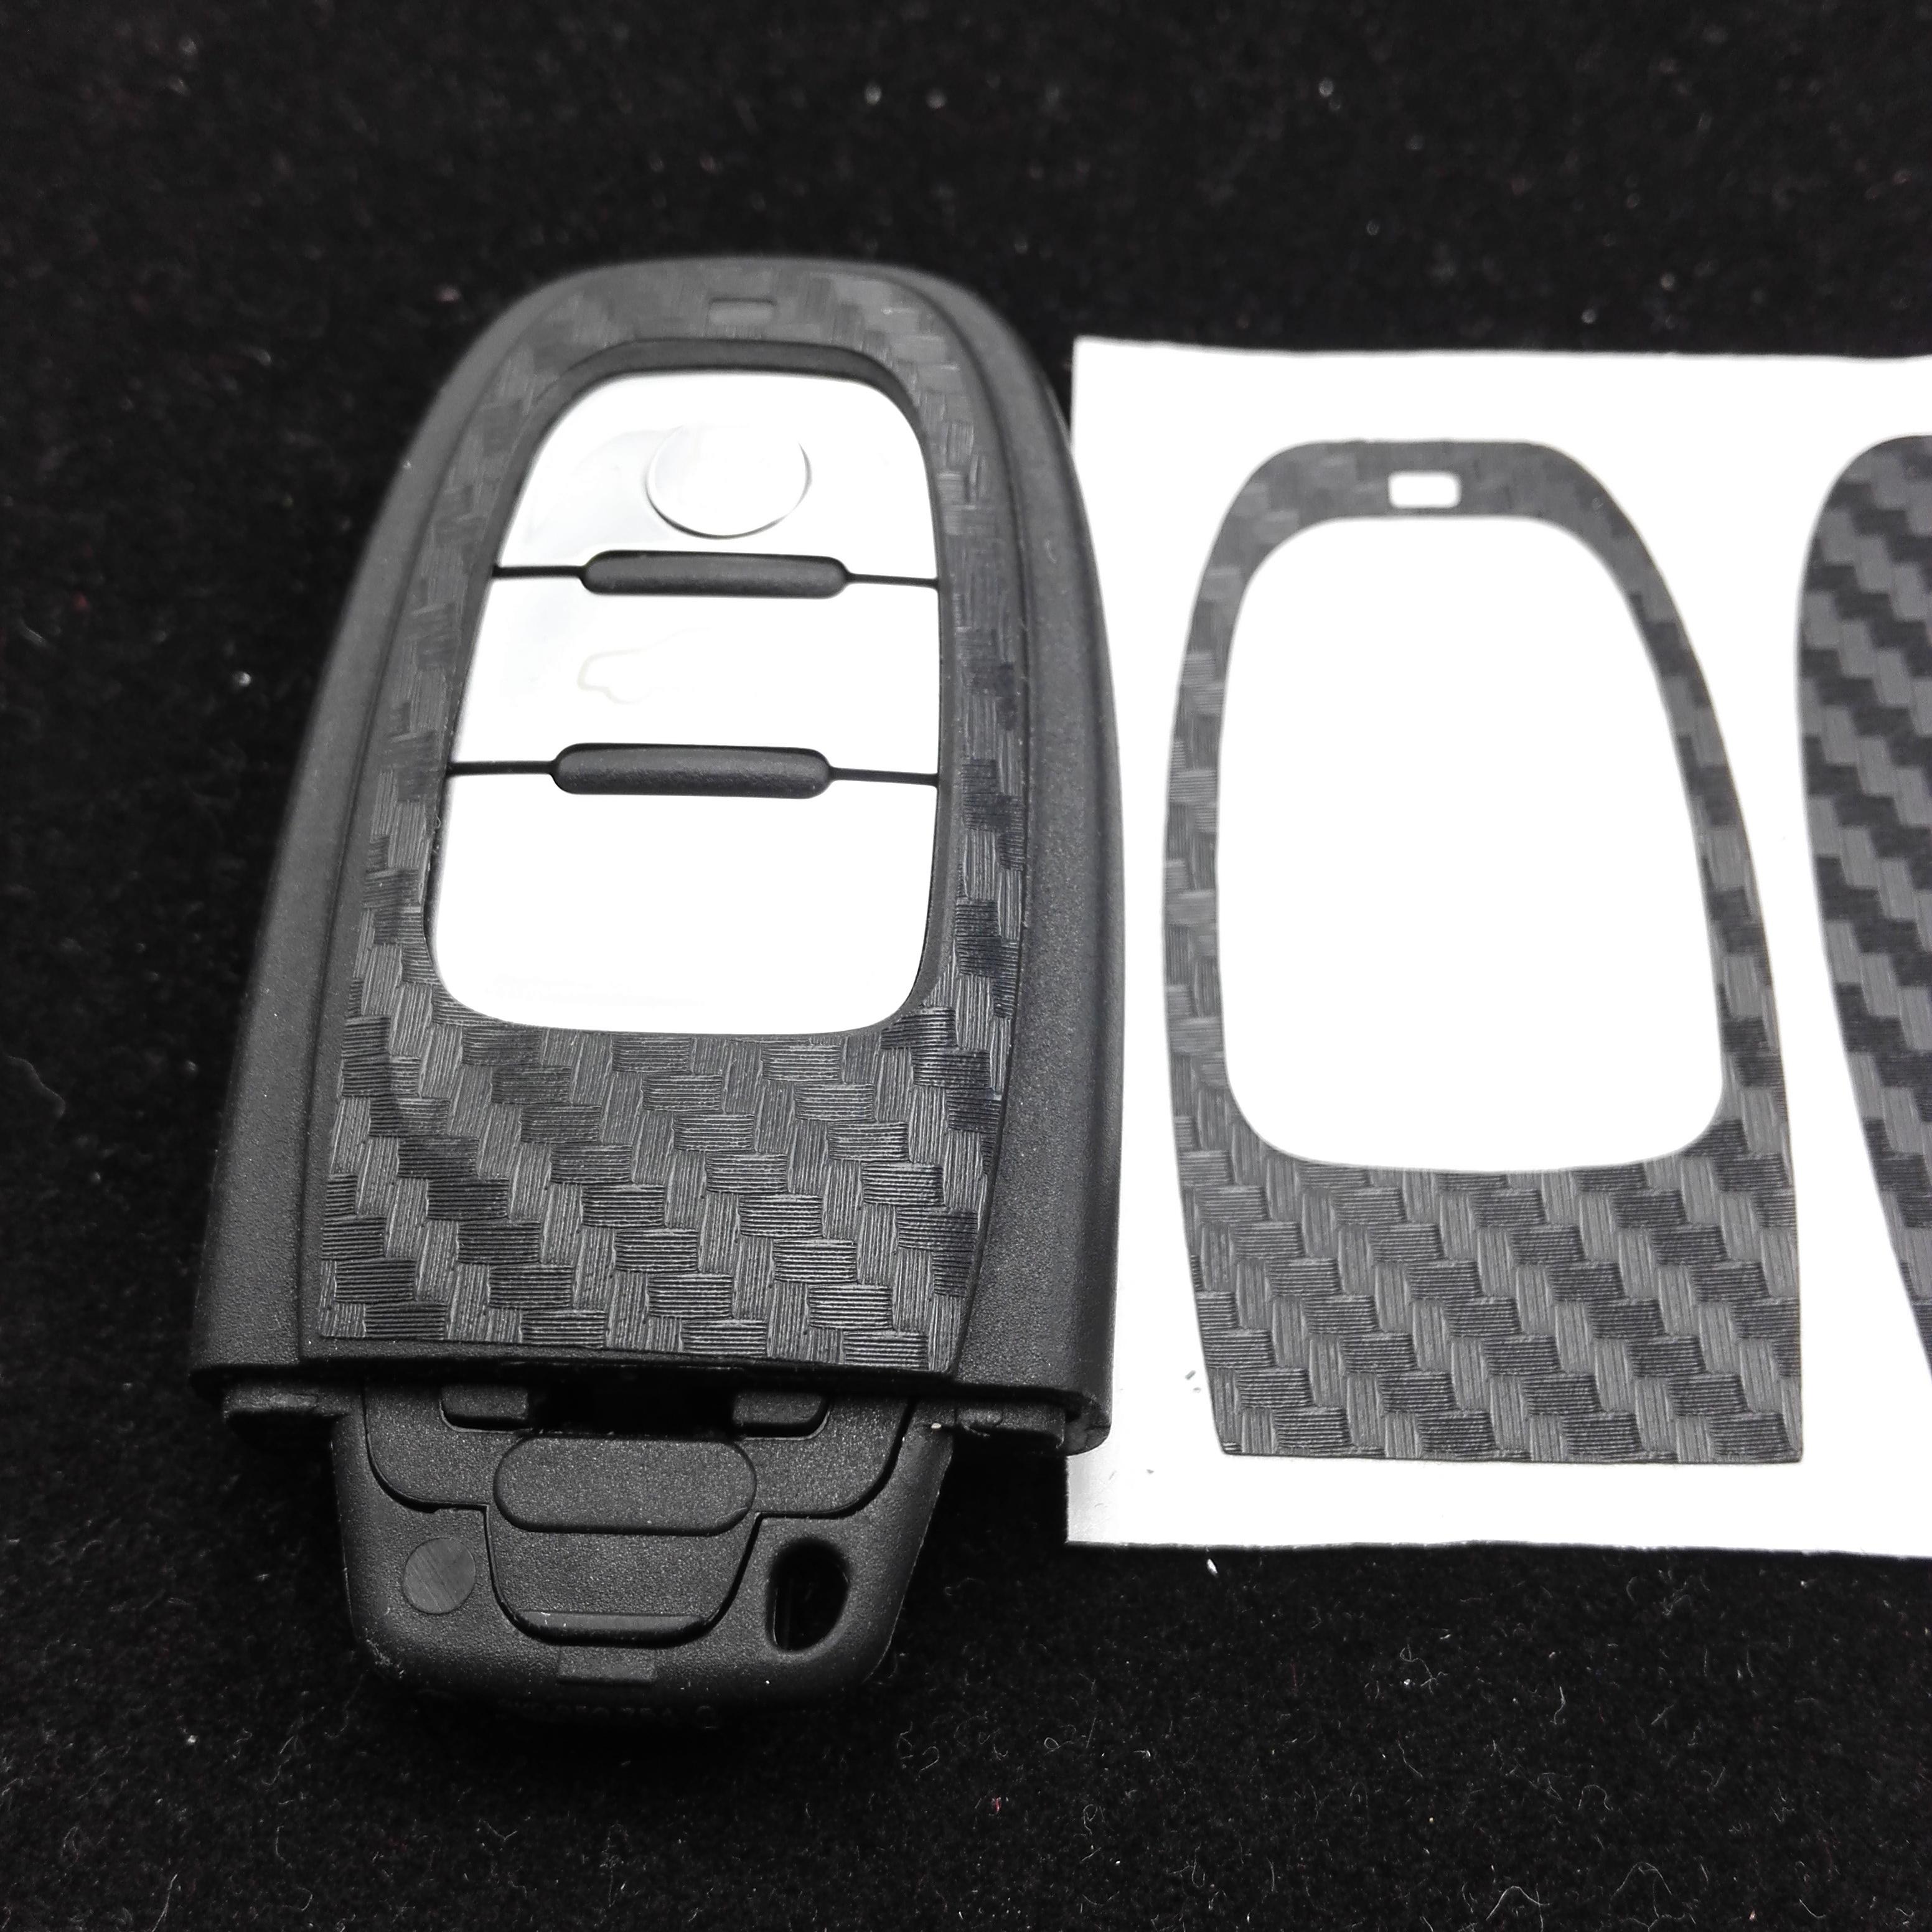 CAR-STYLING black Carbon Fiber Car Key Sticker For Audi A4 A6 RS4 A5 A7 A8 S5 RS5 8T Q5 S5 S6 Key Refitting Accessories